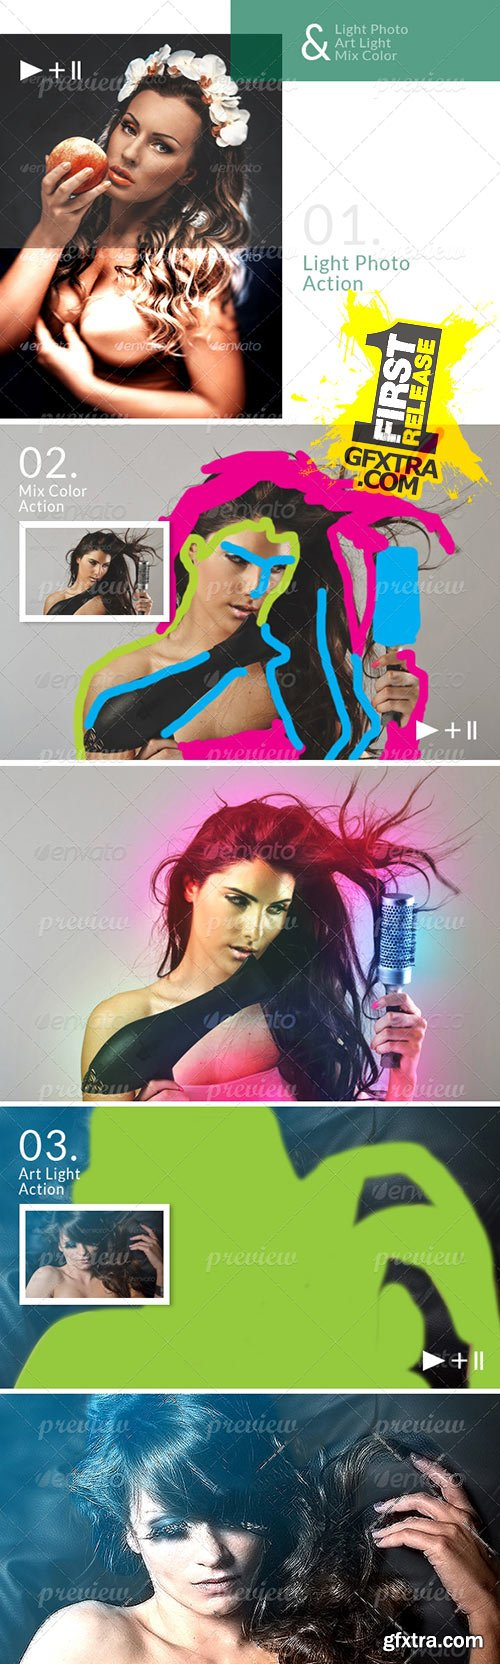 CodeGrape - Photoshop Effect Action 4275